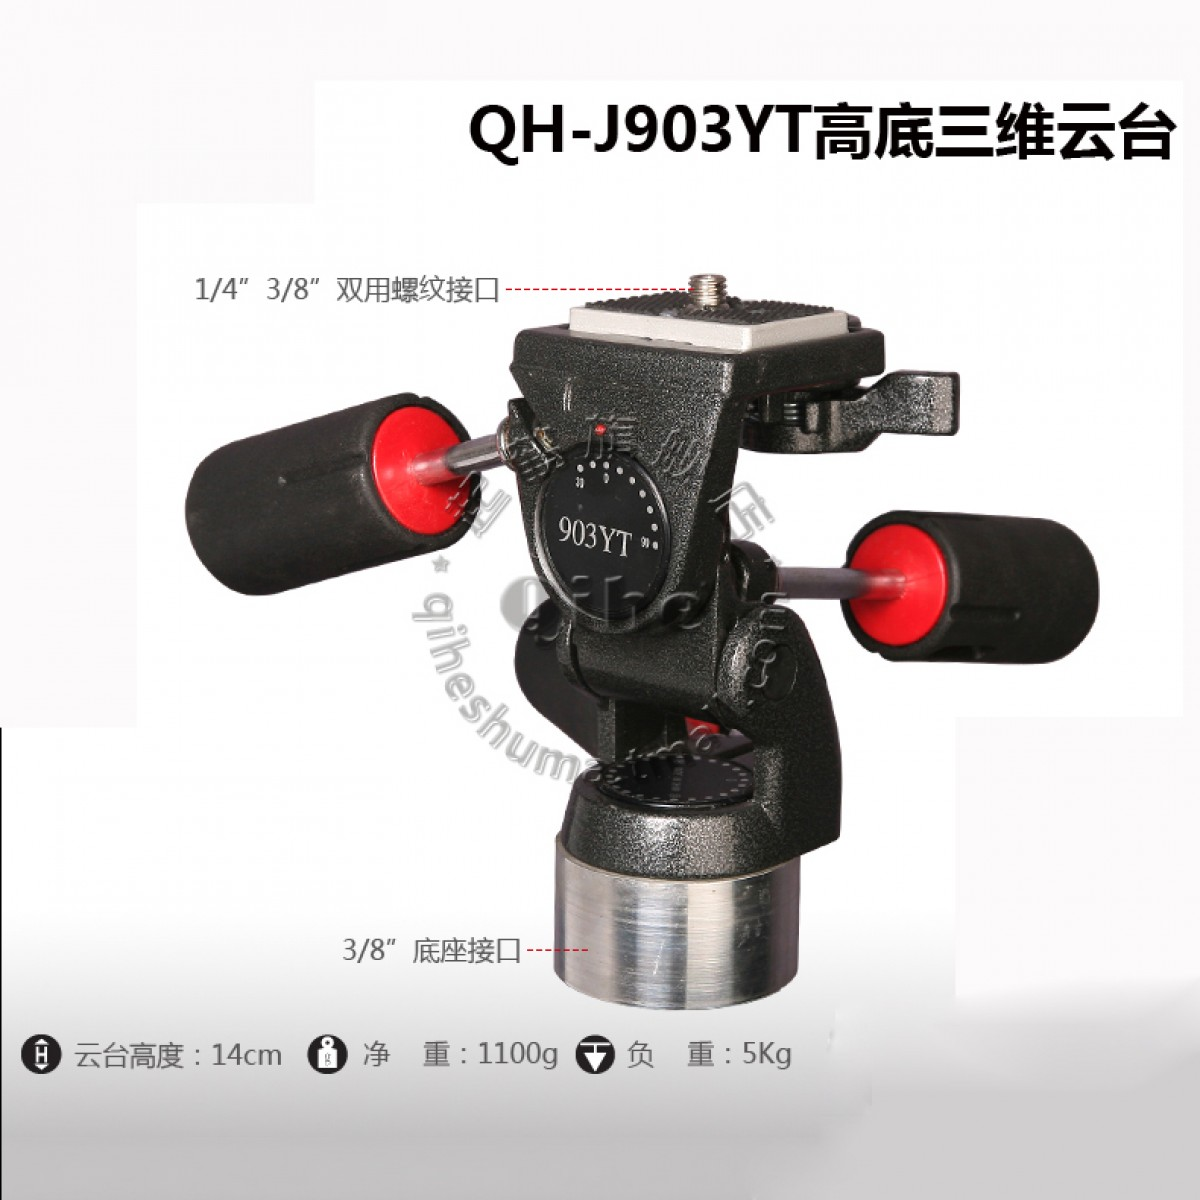 Qihe起鹤牌 QH-J903YT高底立架专业云台